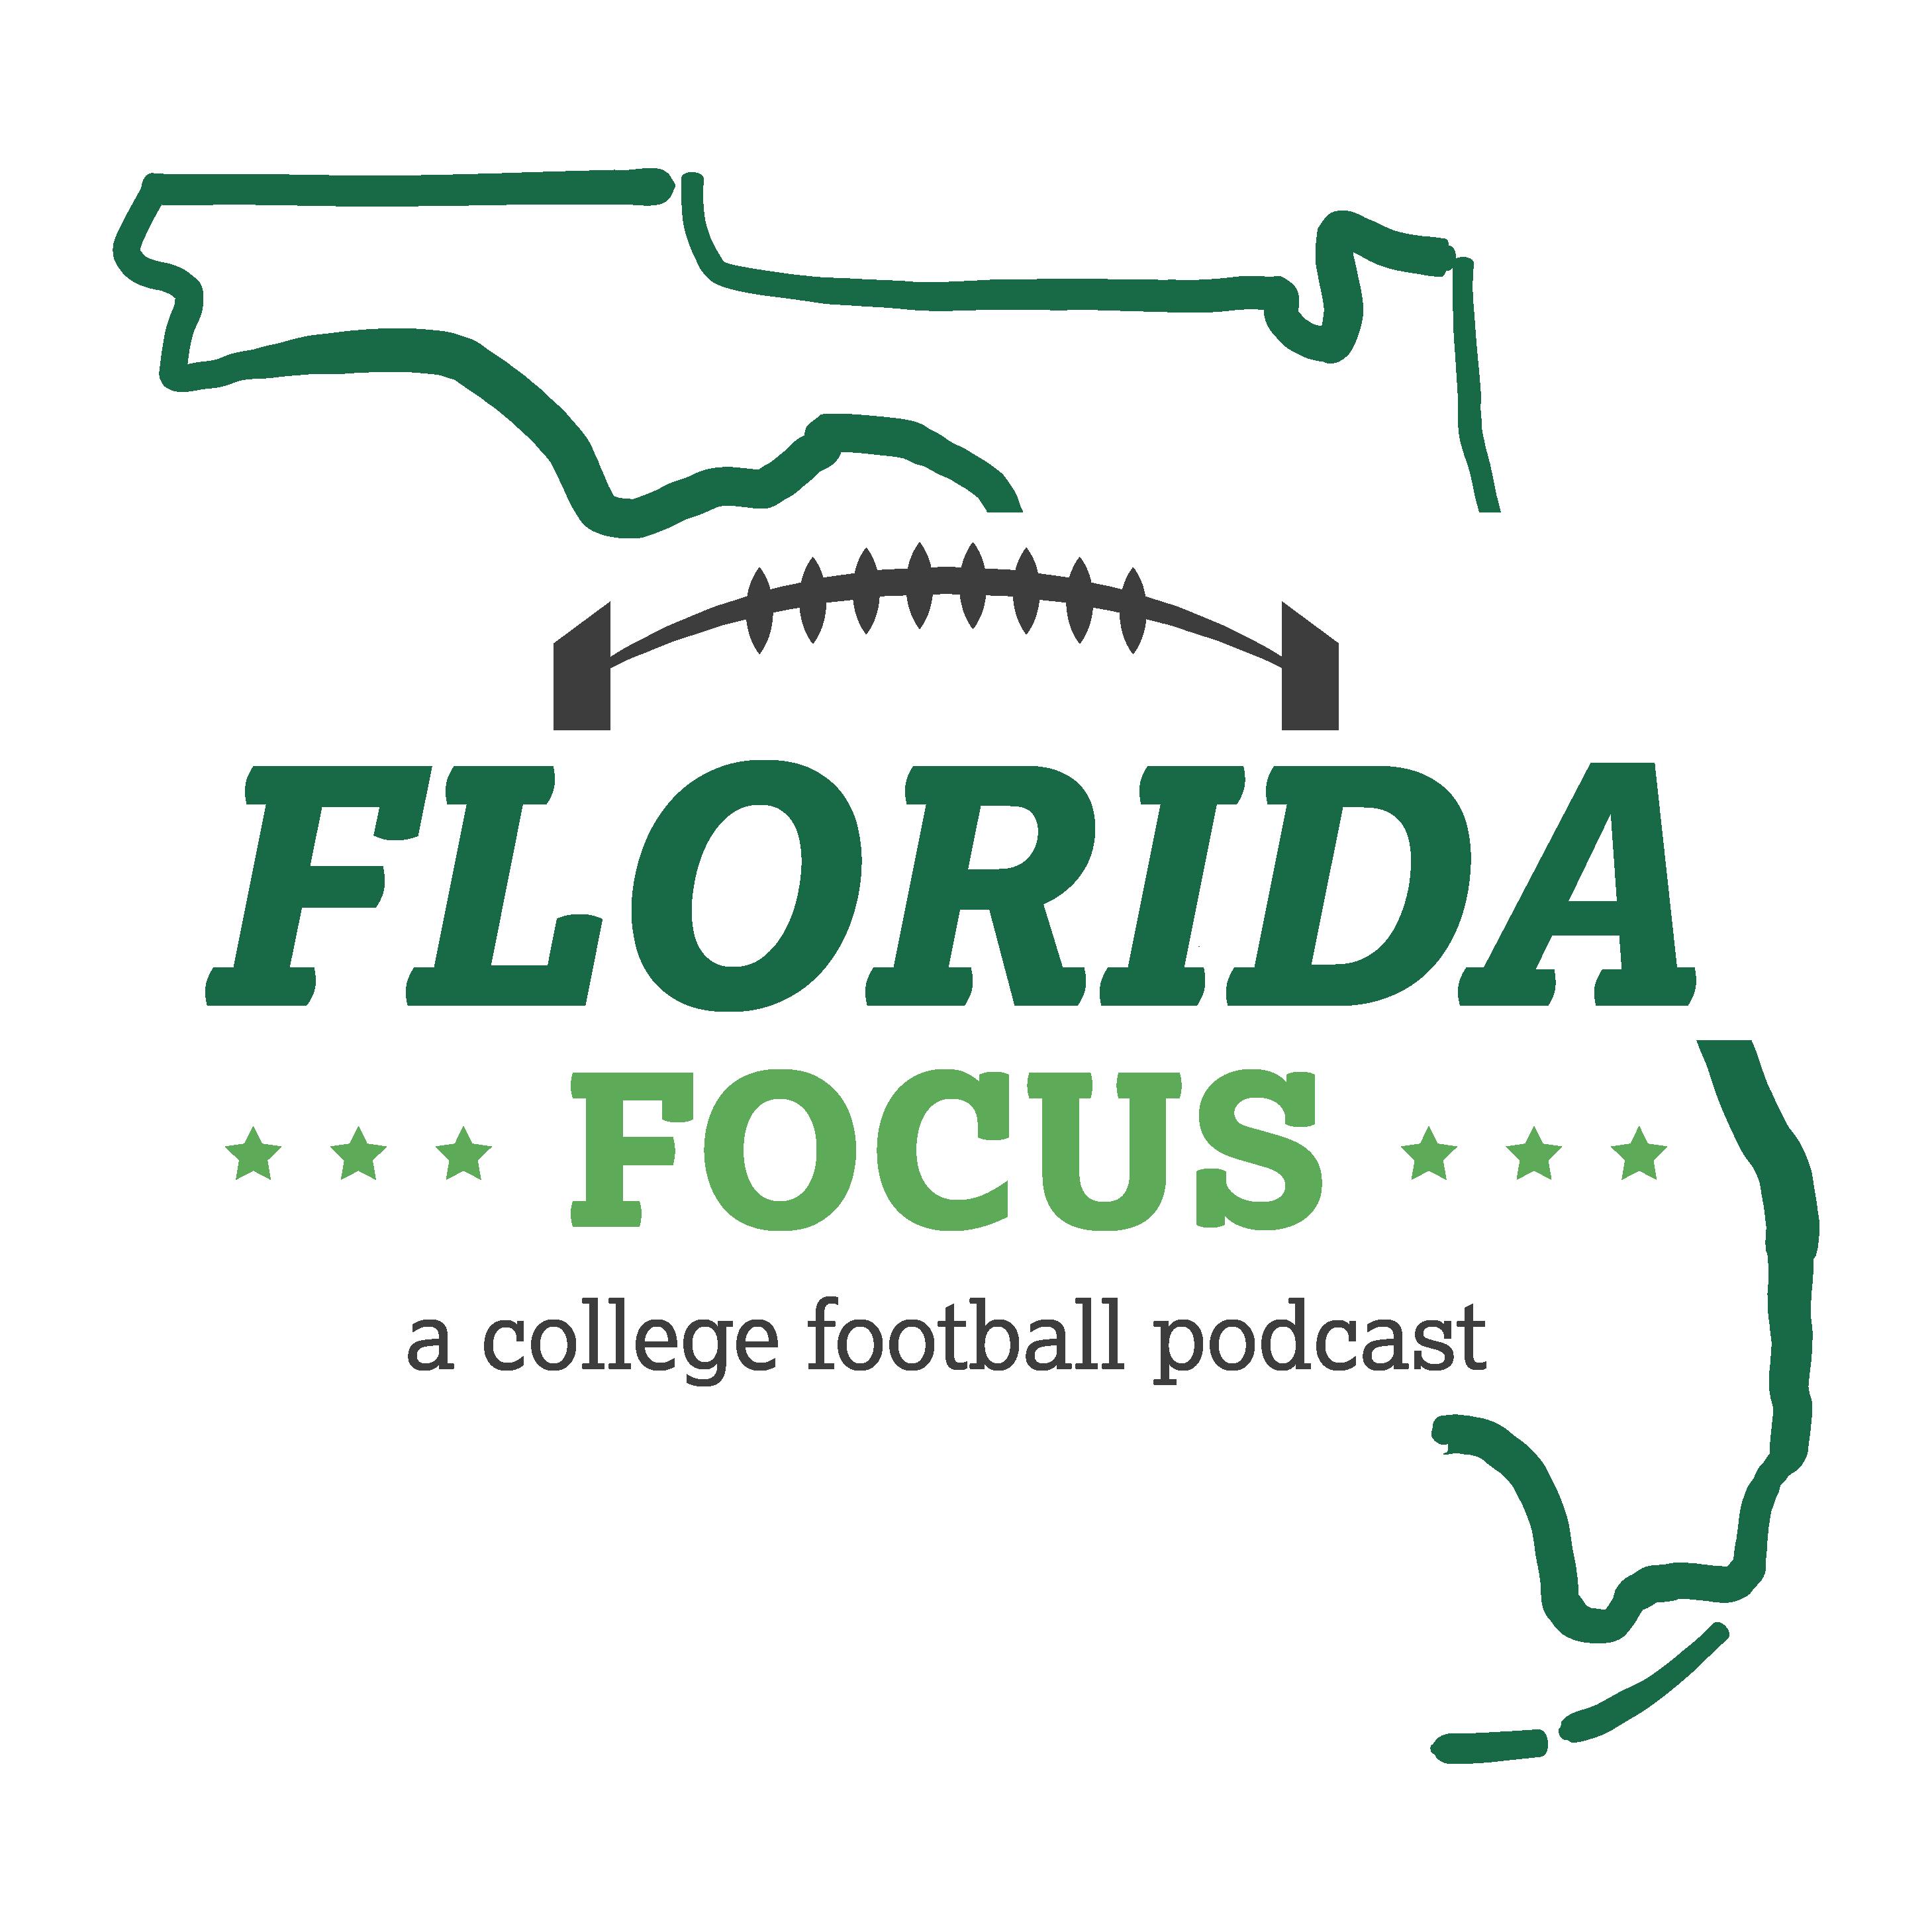 Florida Focus: A College Football Podcast show art